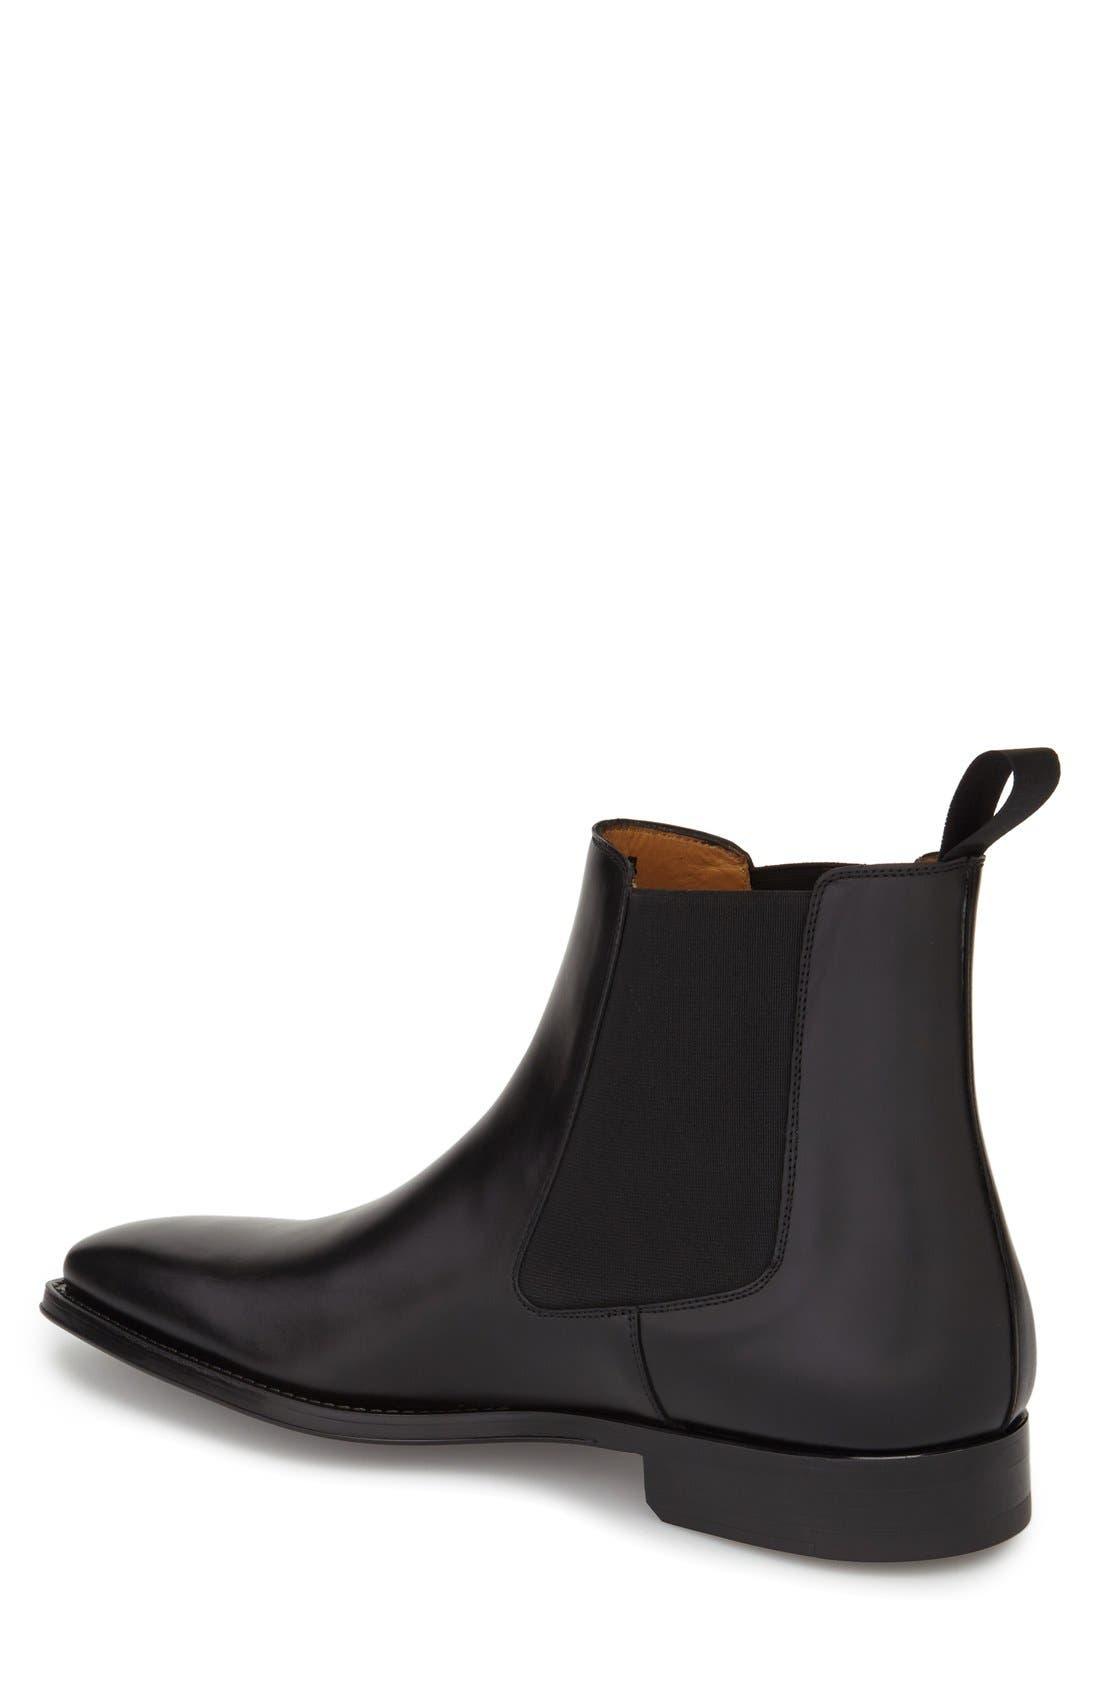 'Sean' Chelsea Boot,                             Alternate thumbnail 2, color,                             Black